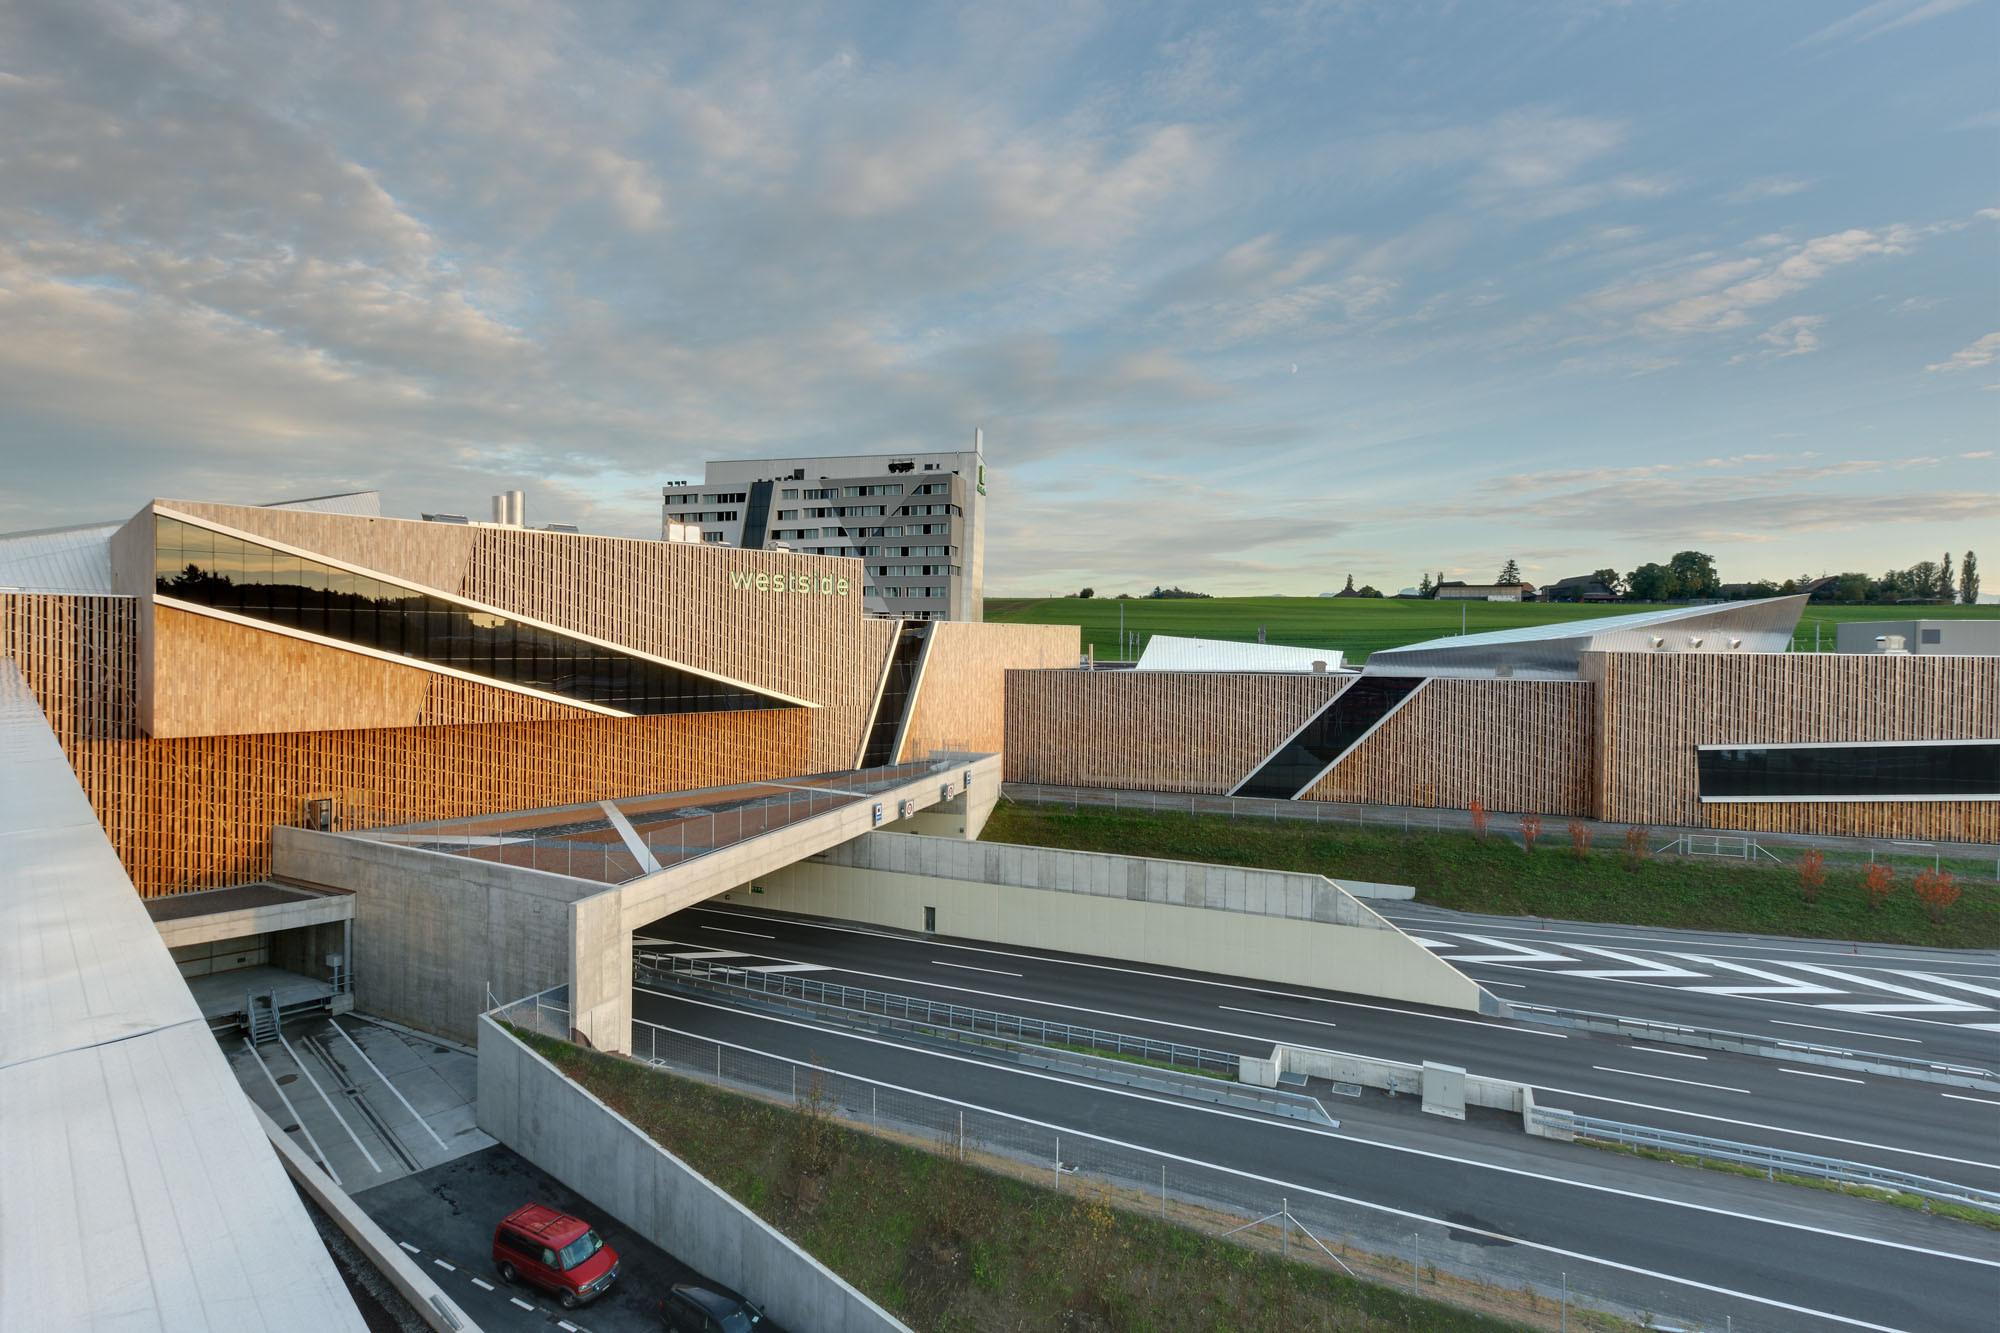 Westside Bruennen / Daniel Libeskind, © Daniel Libeskind